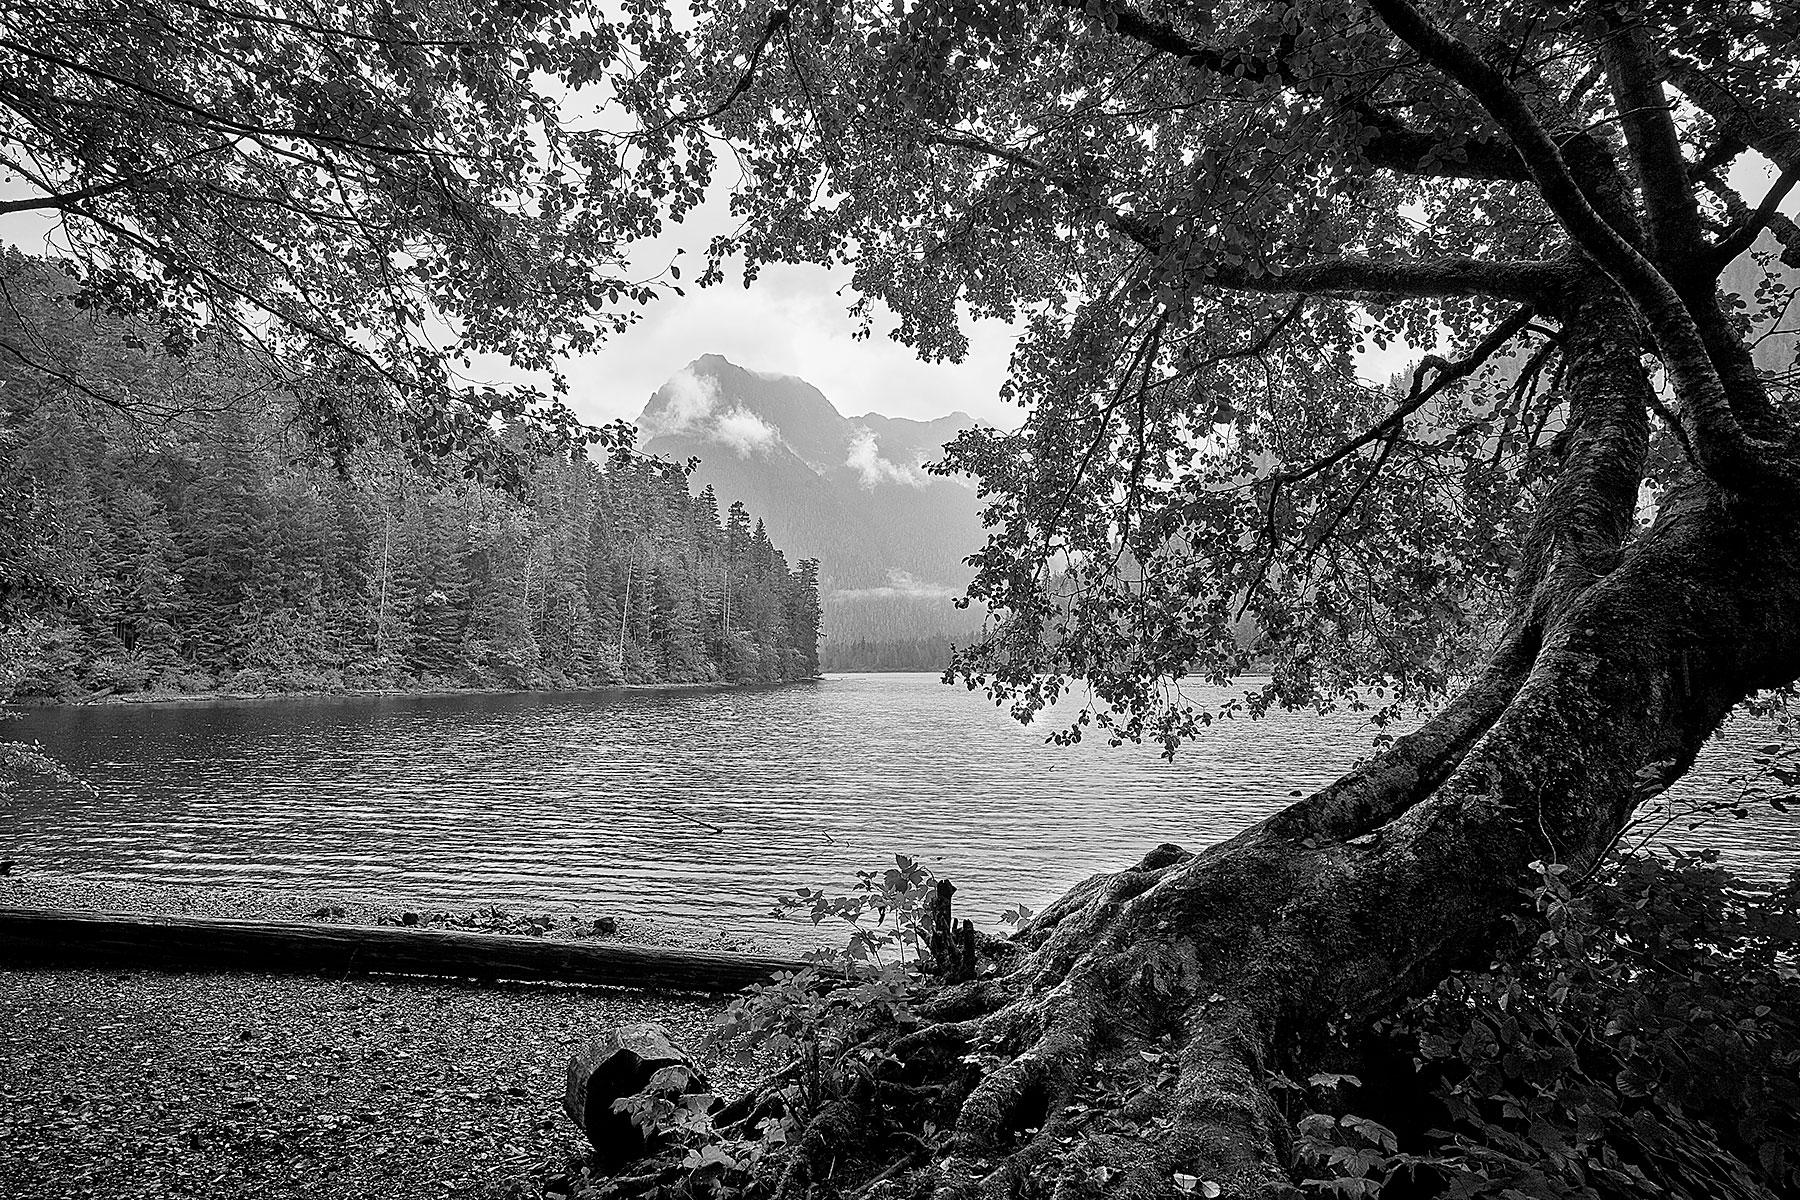 Schoen Lake Campsite © johncameron.ca